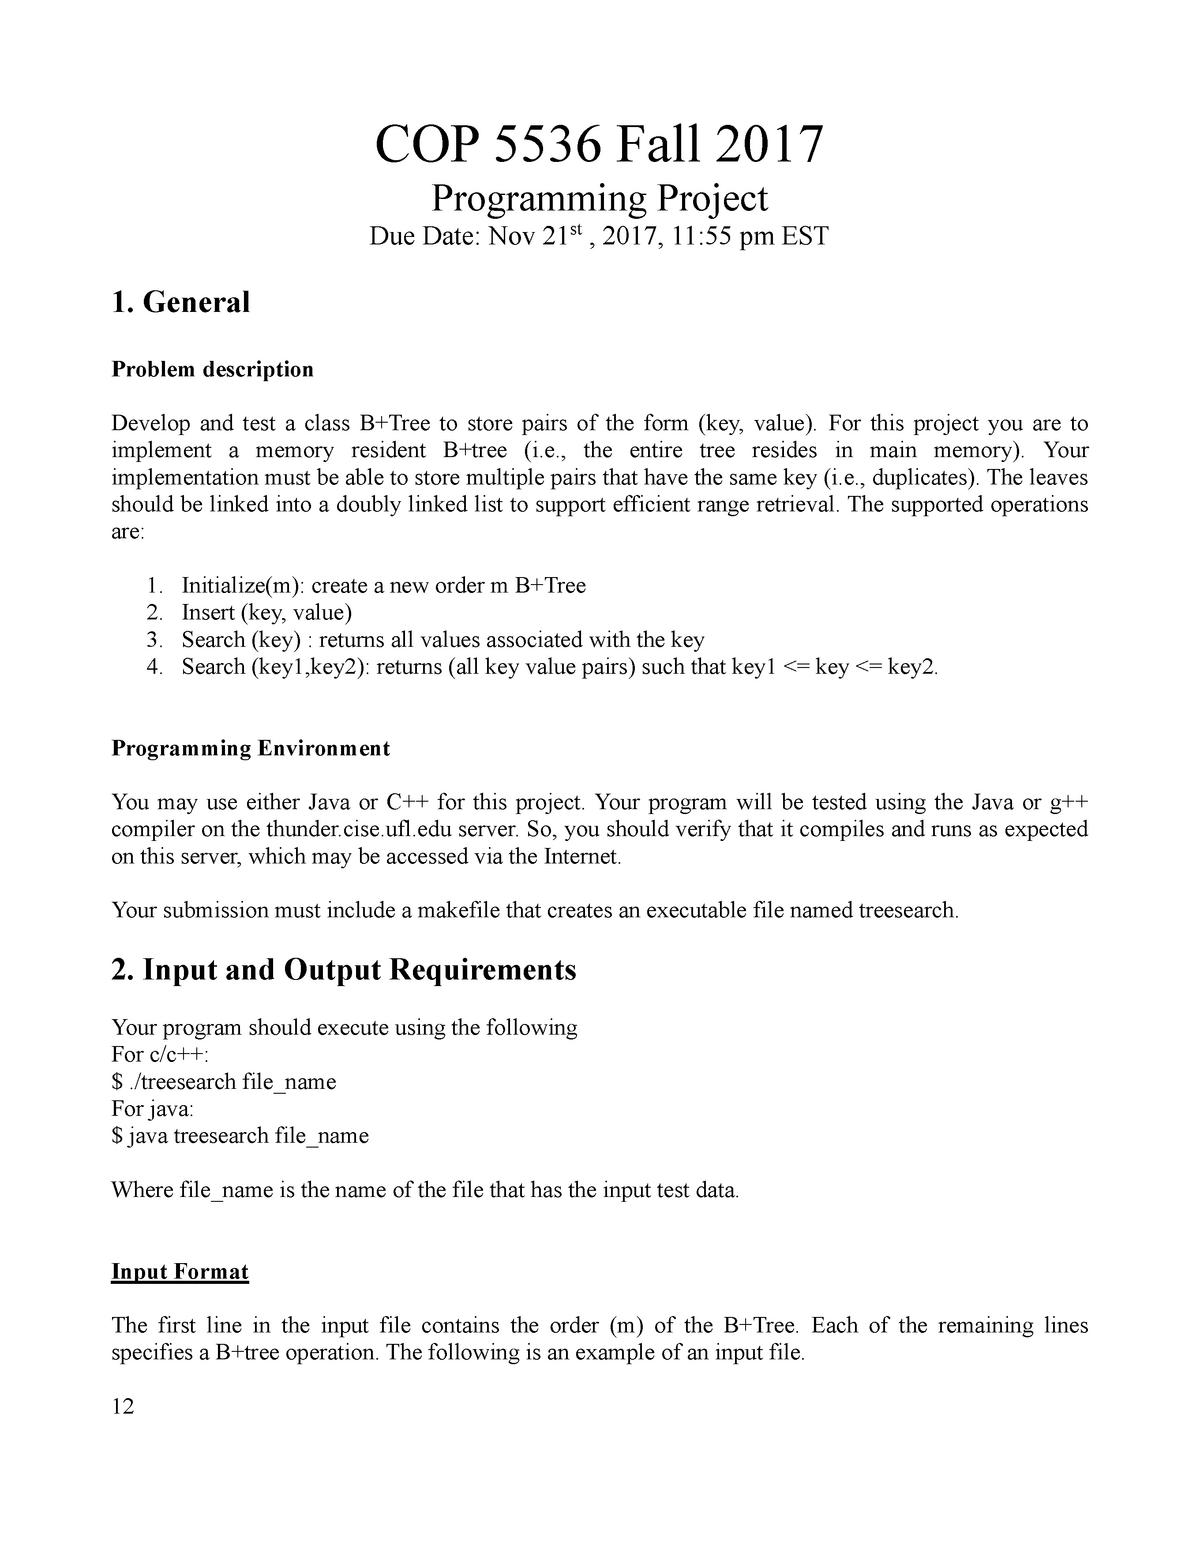 Project FA17 - COP 5536: Adv Data Structures - StuDocu